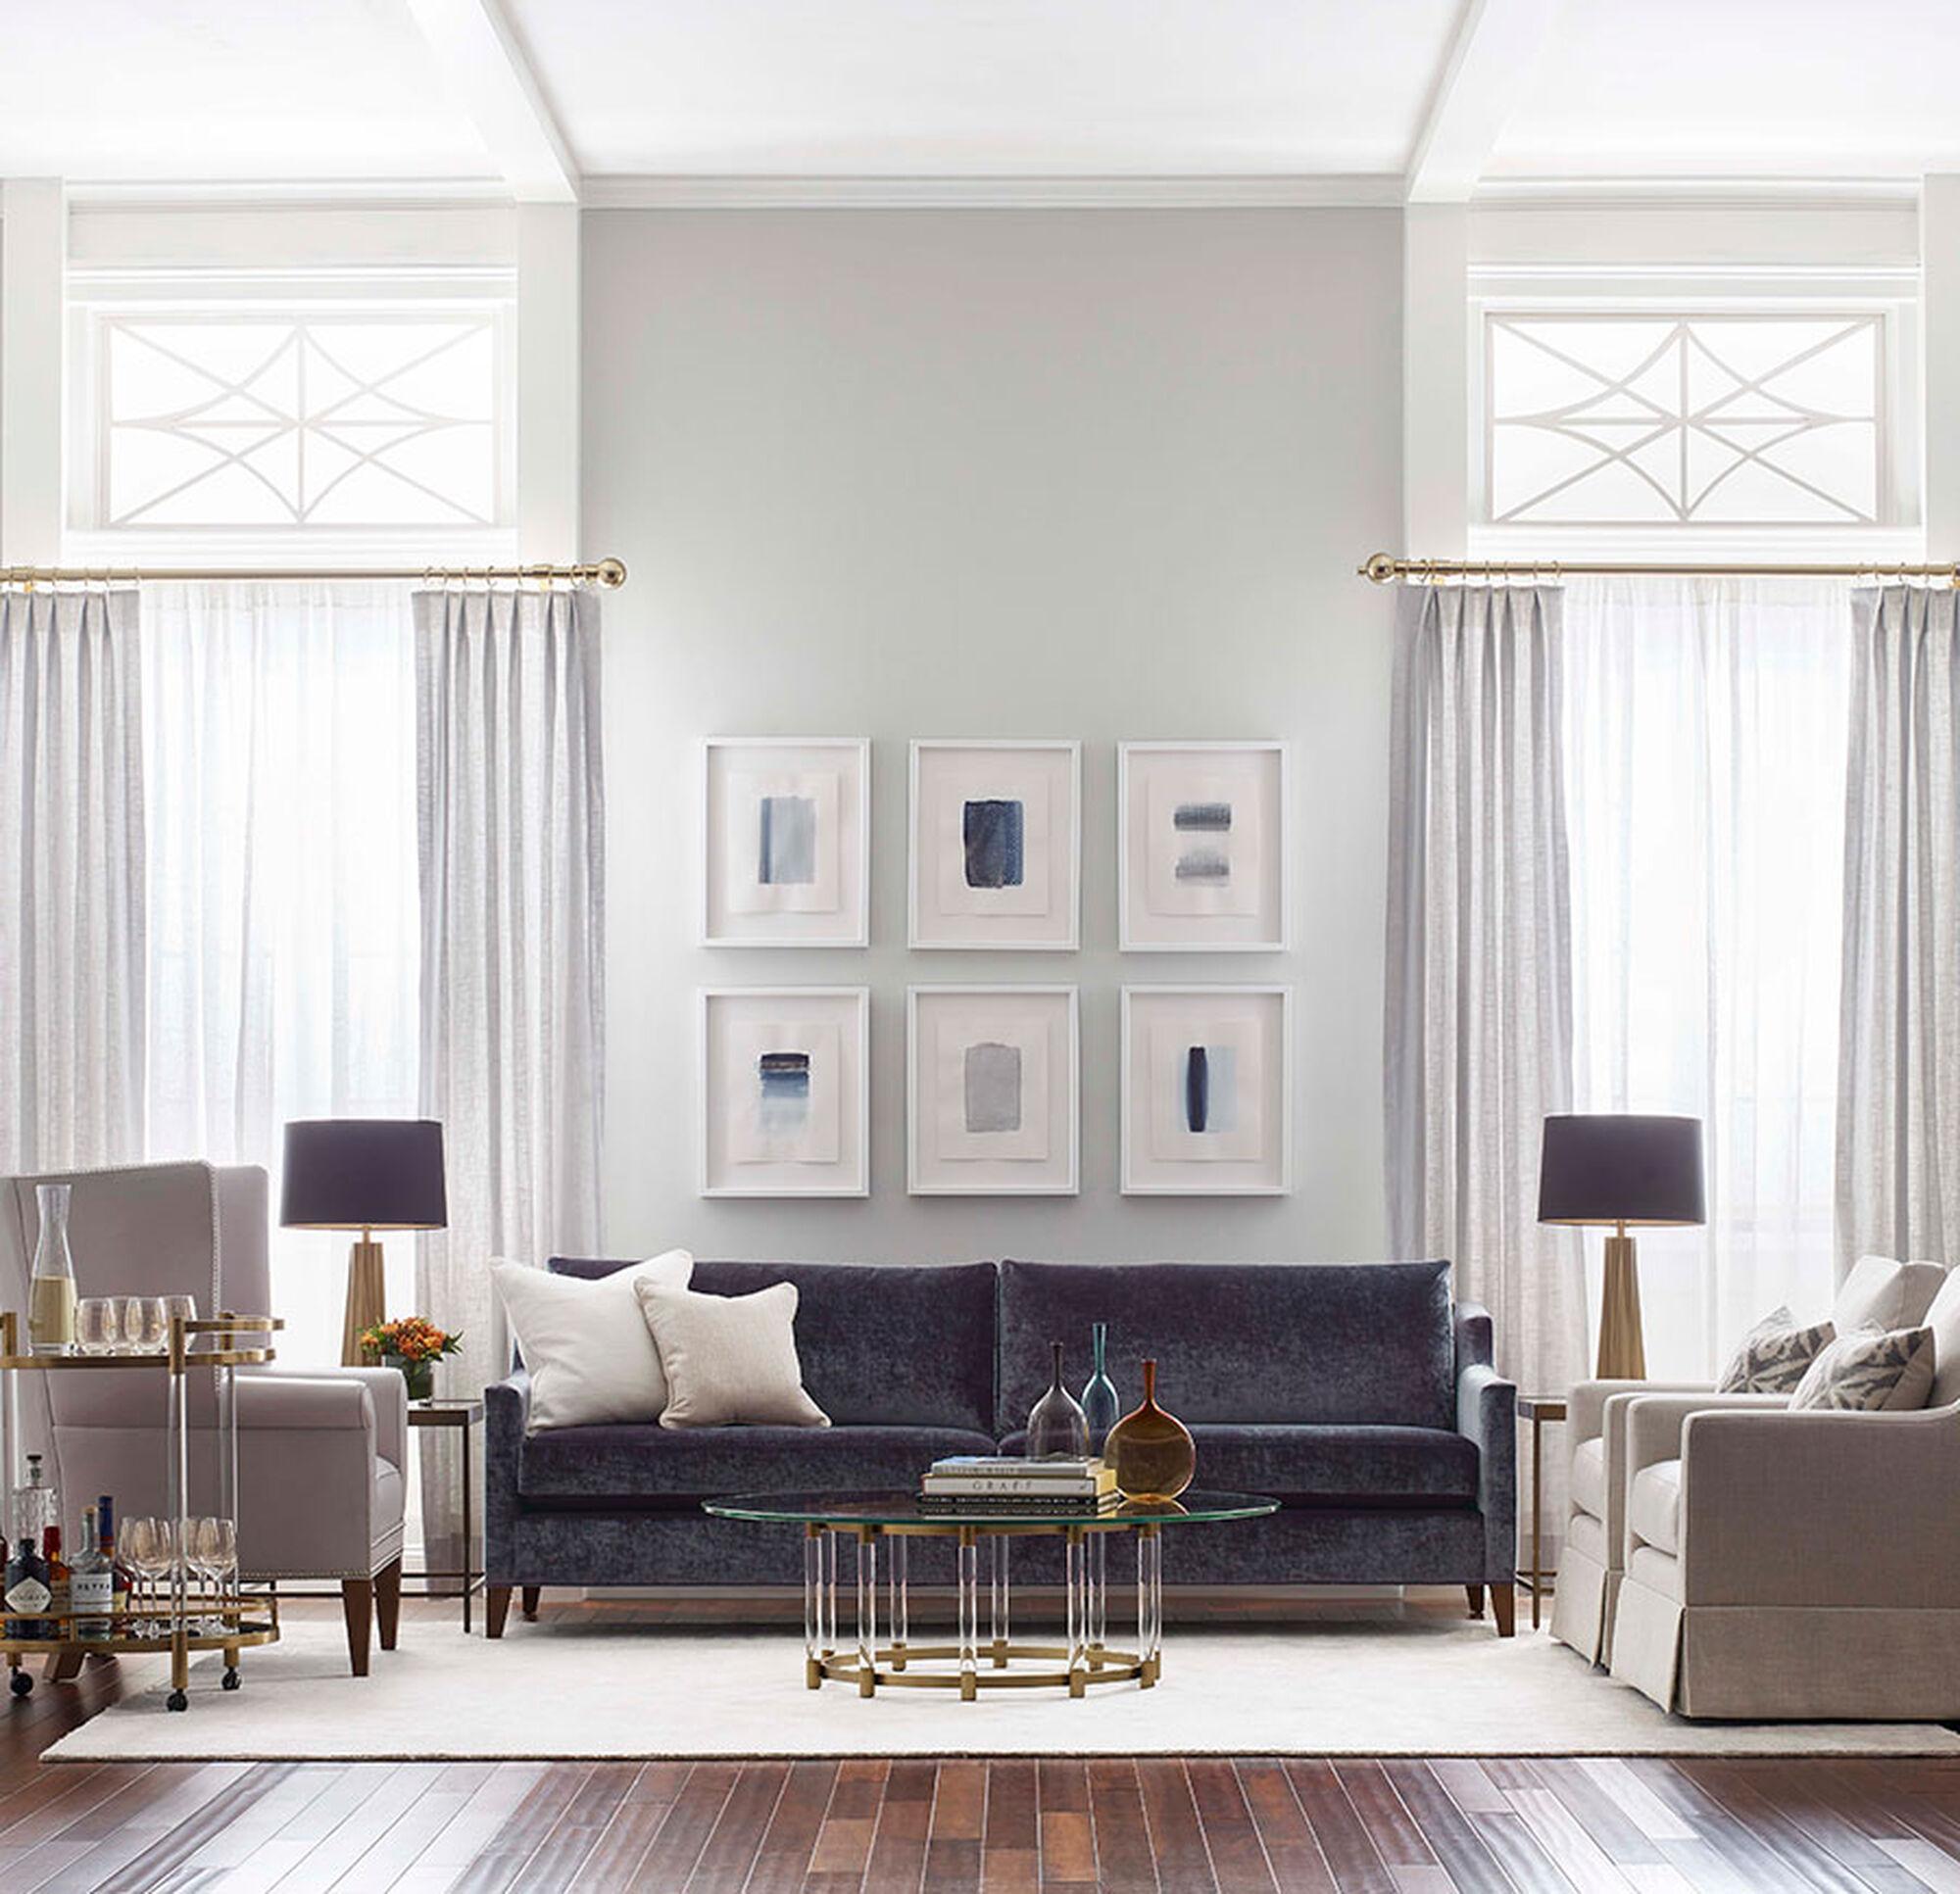 williams pin couches furniture bob martin mitchell gold sofa leather